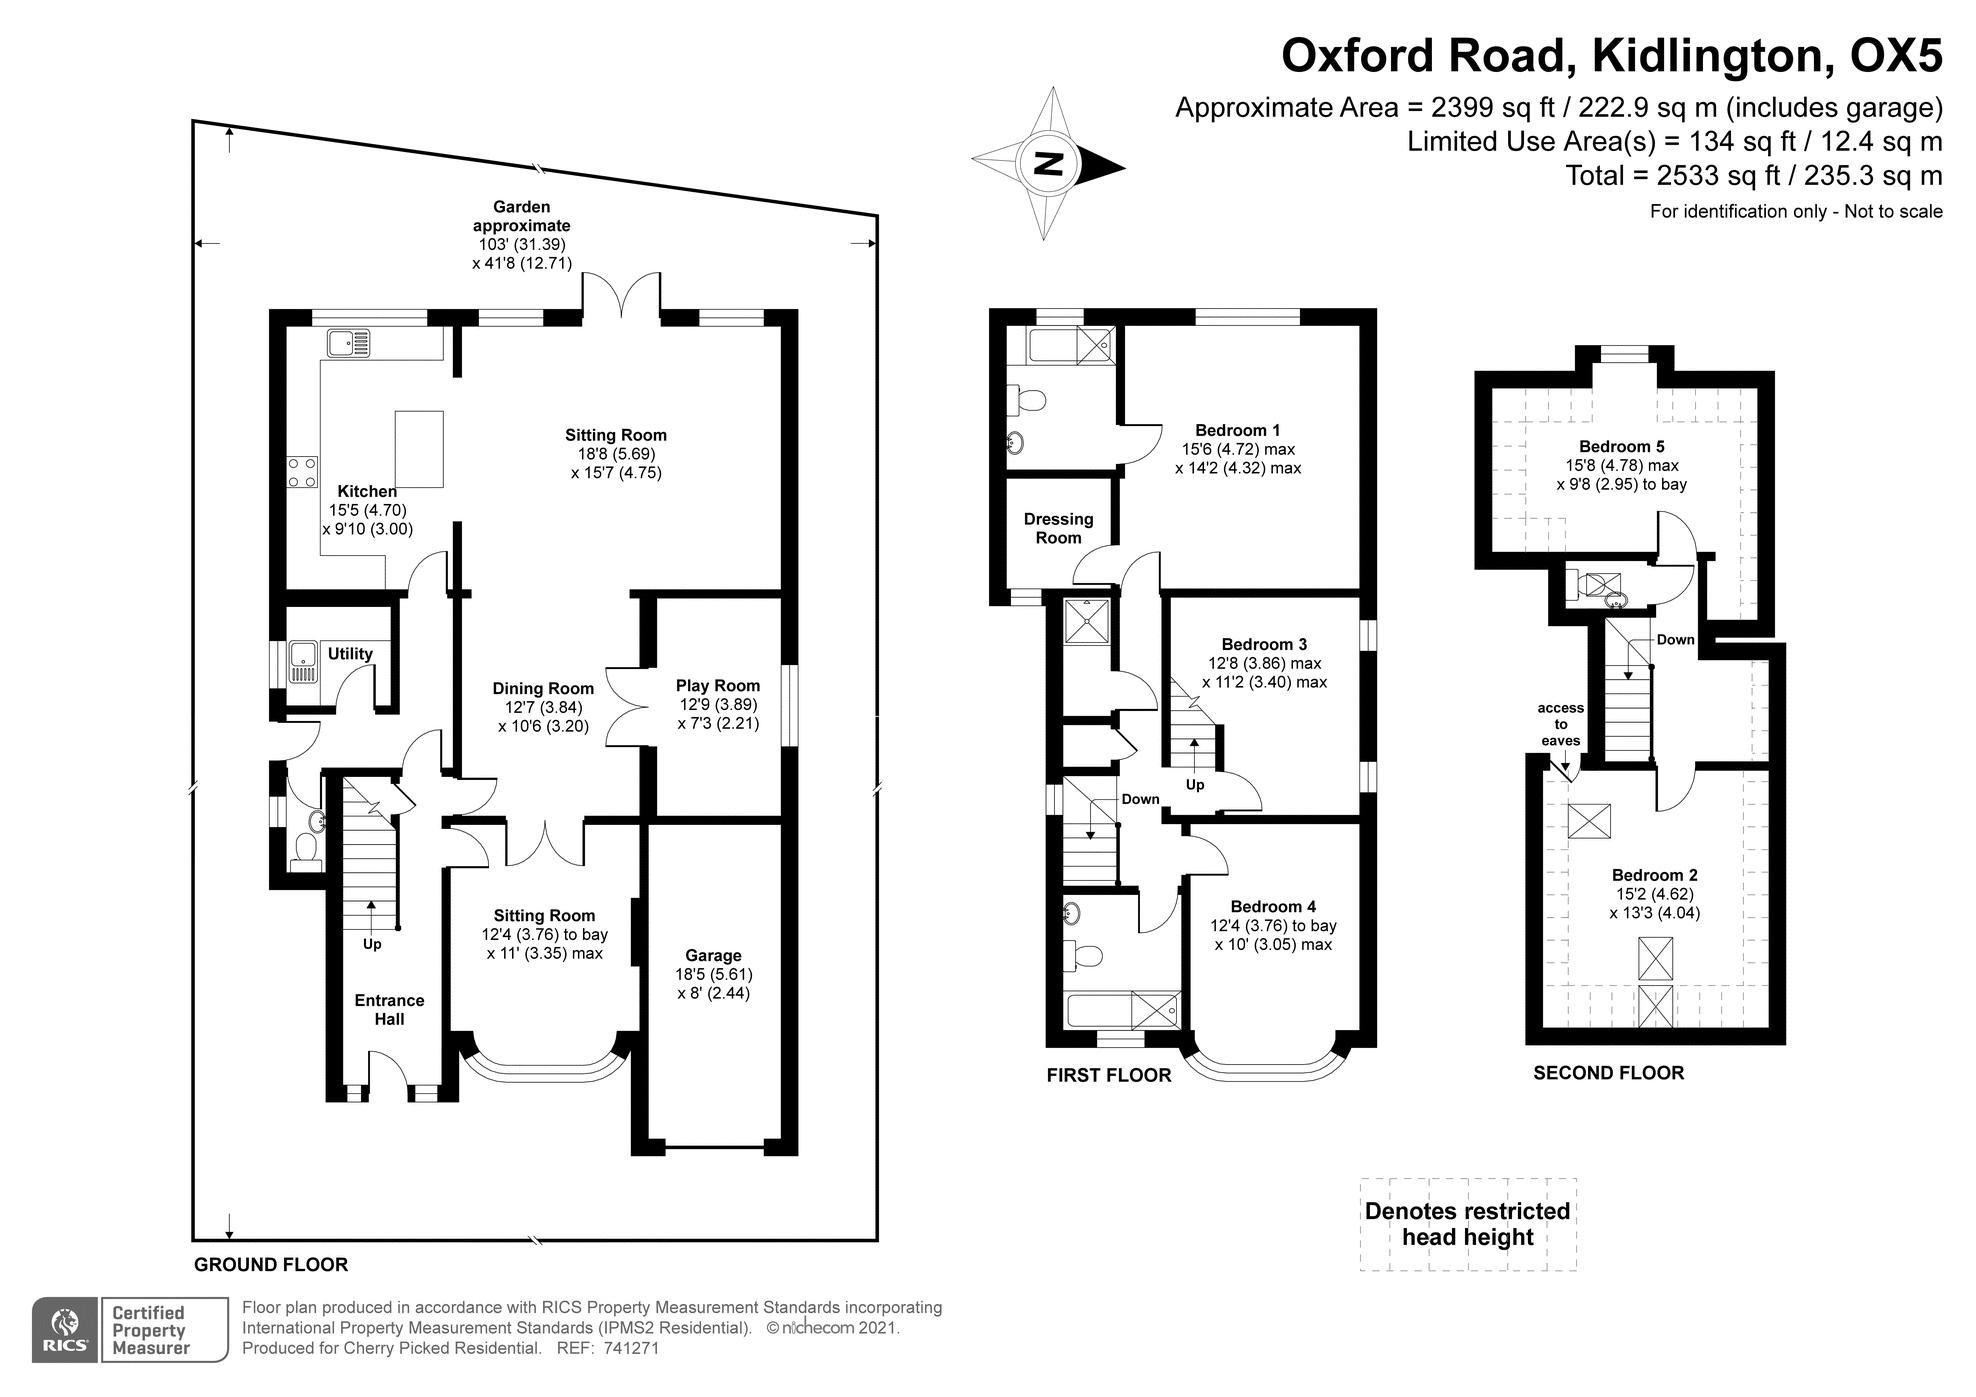 Oxford Road